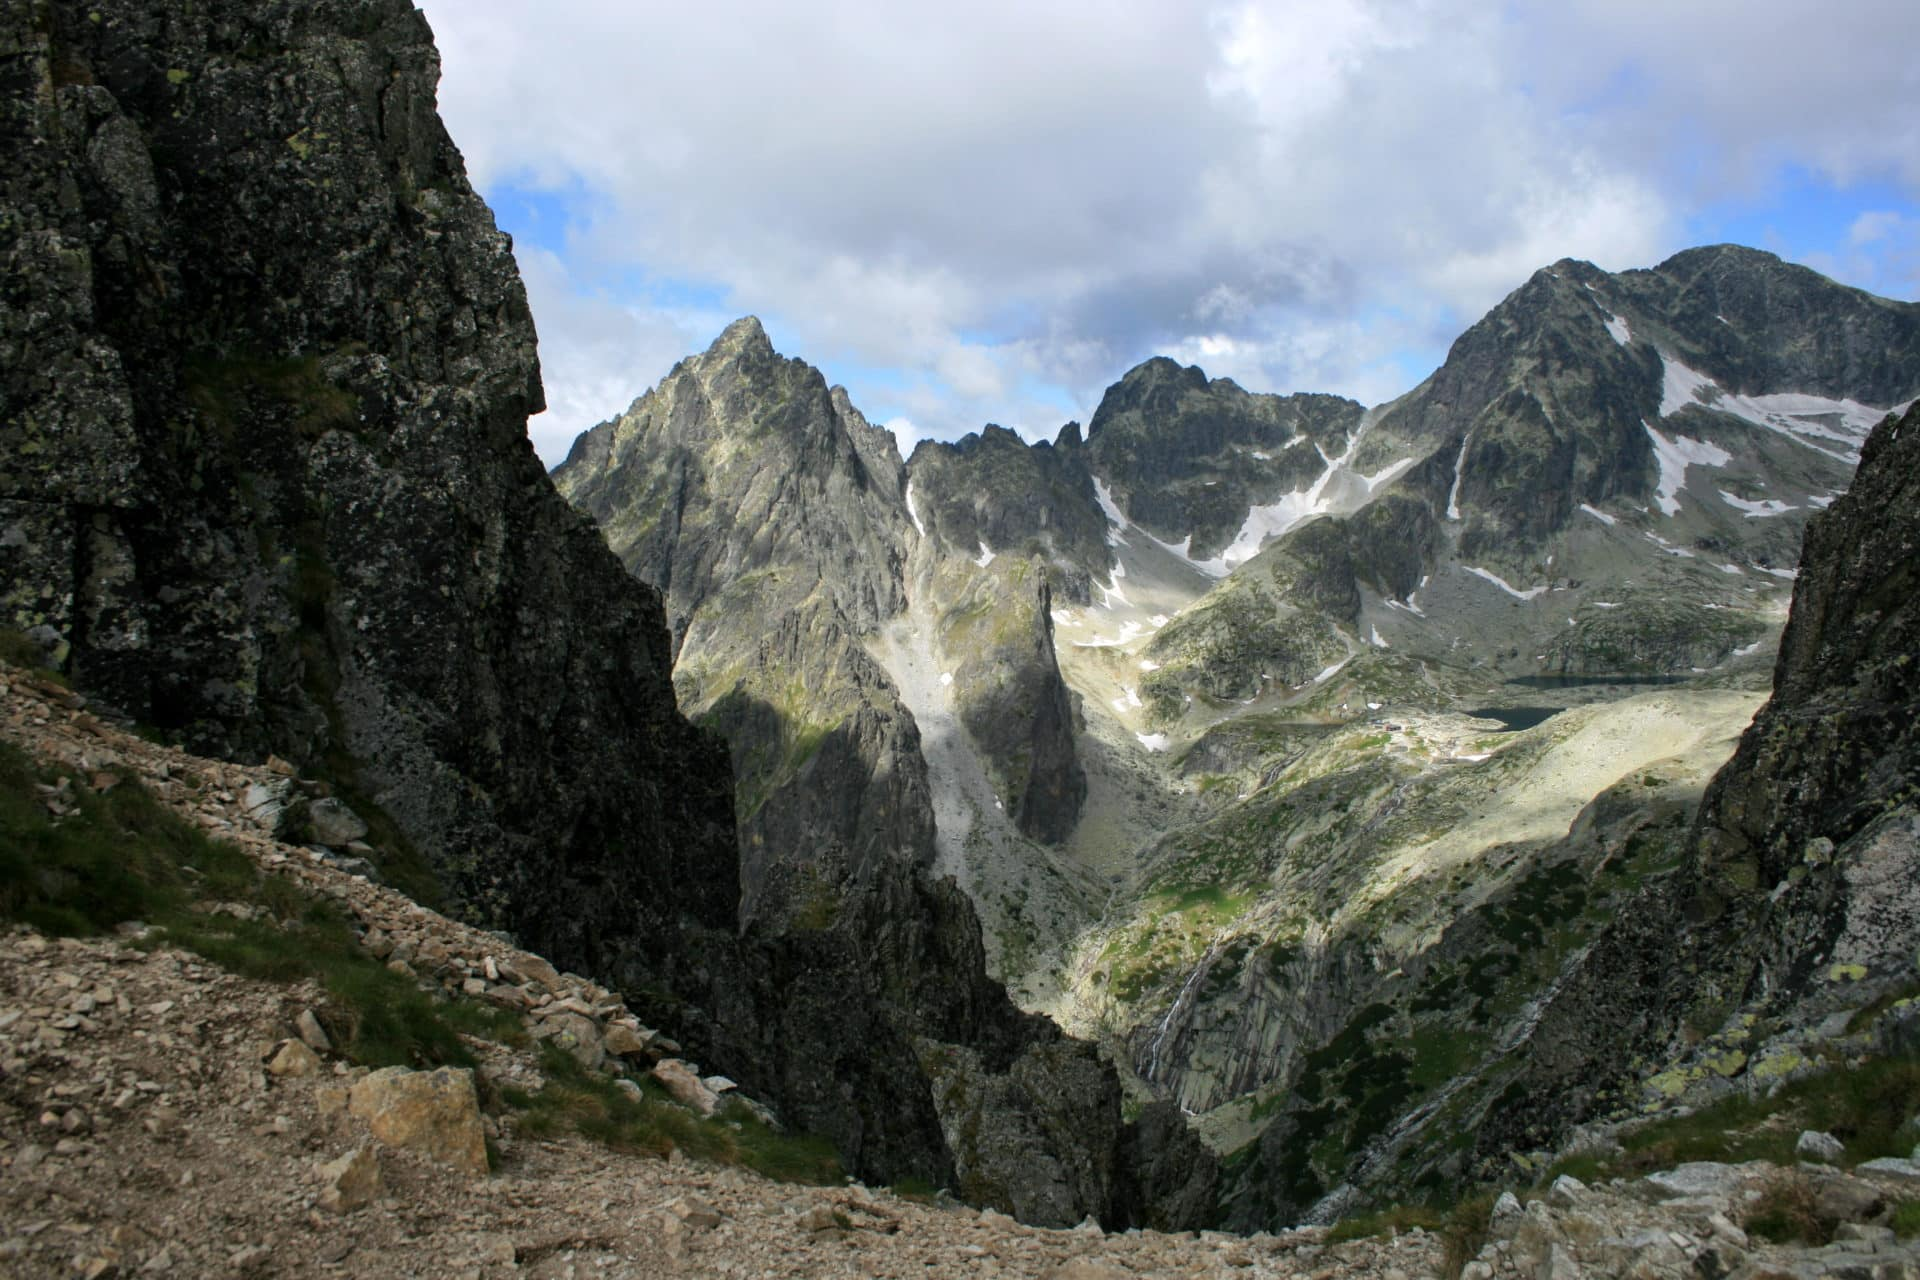 Guided scrambling in High Tatras' secret spots